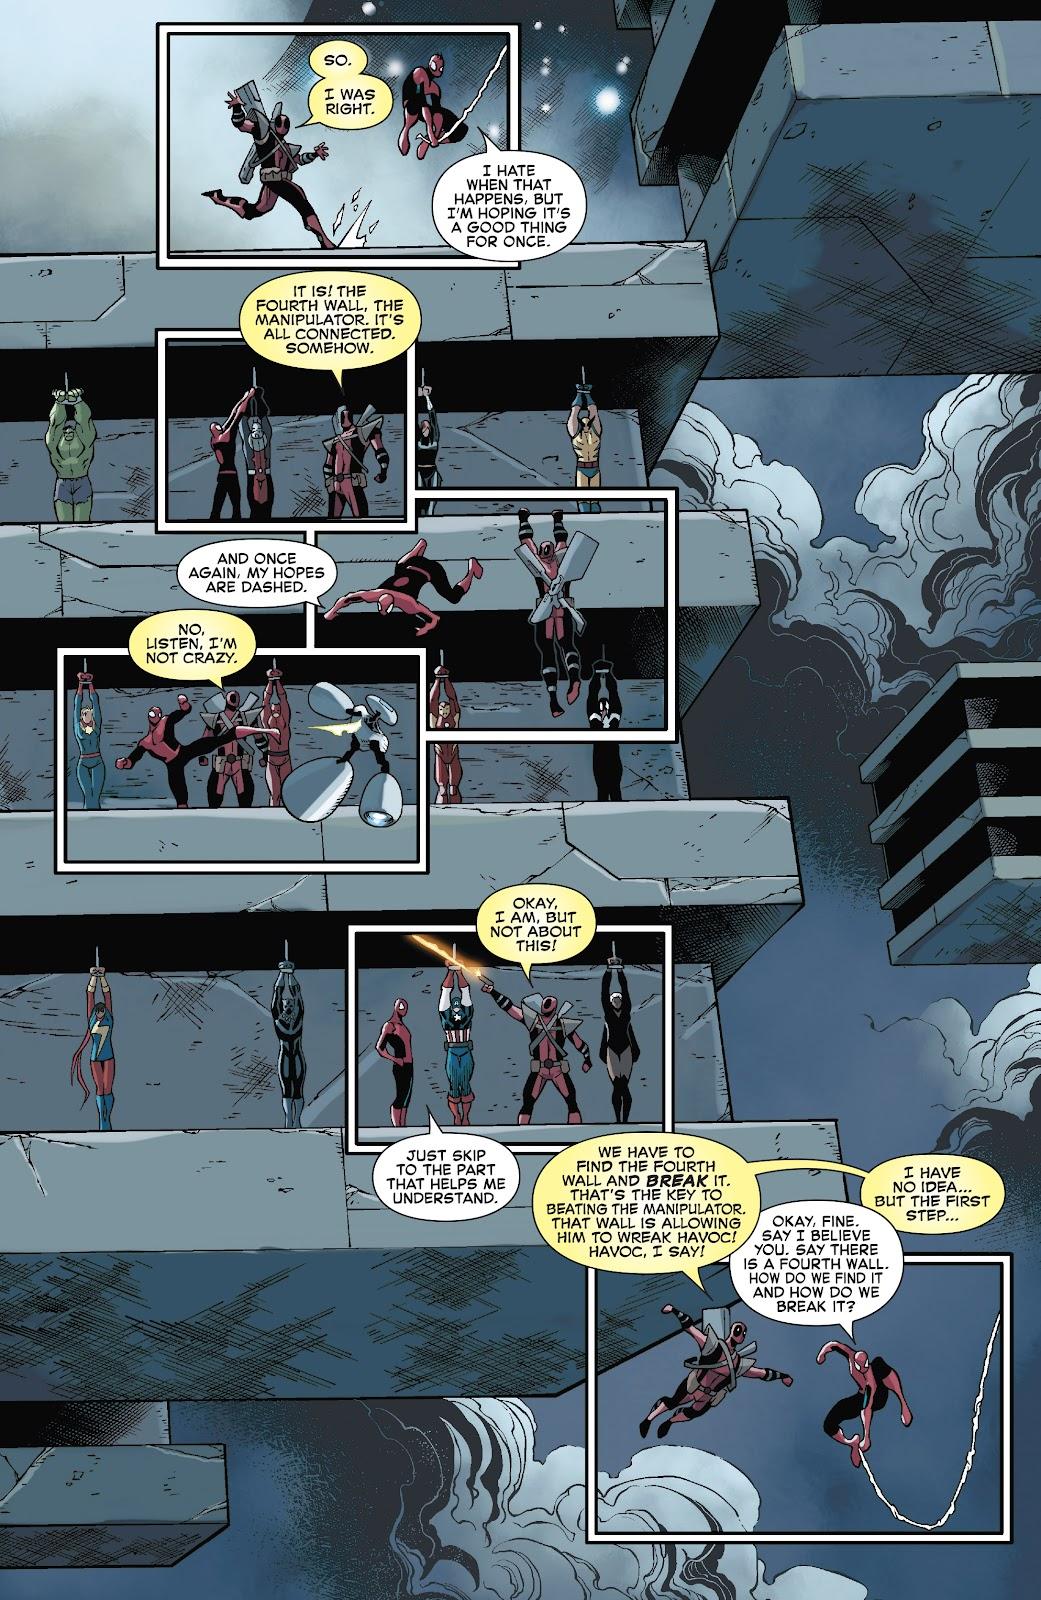 Read online Spider-Man/Deadpool comic -  Issue #48 - 17